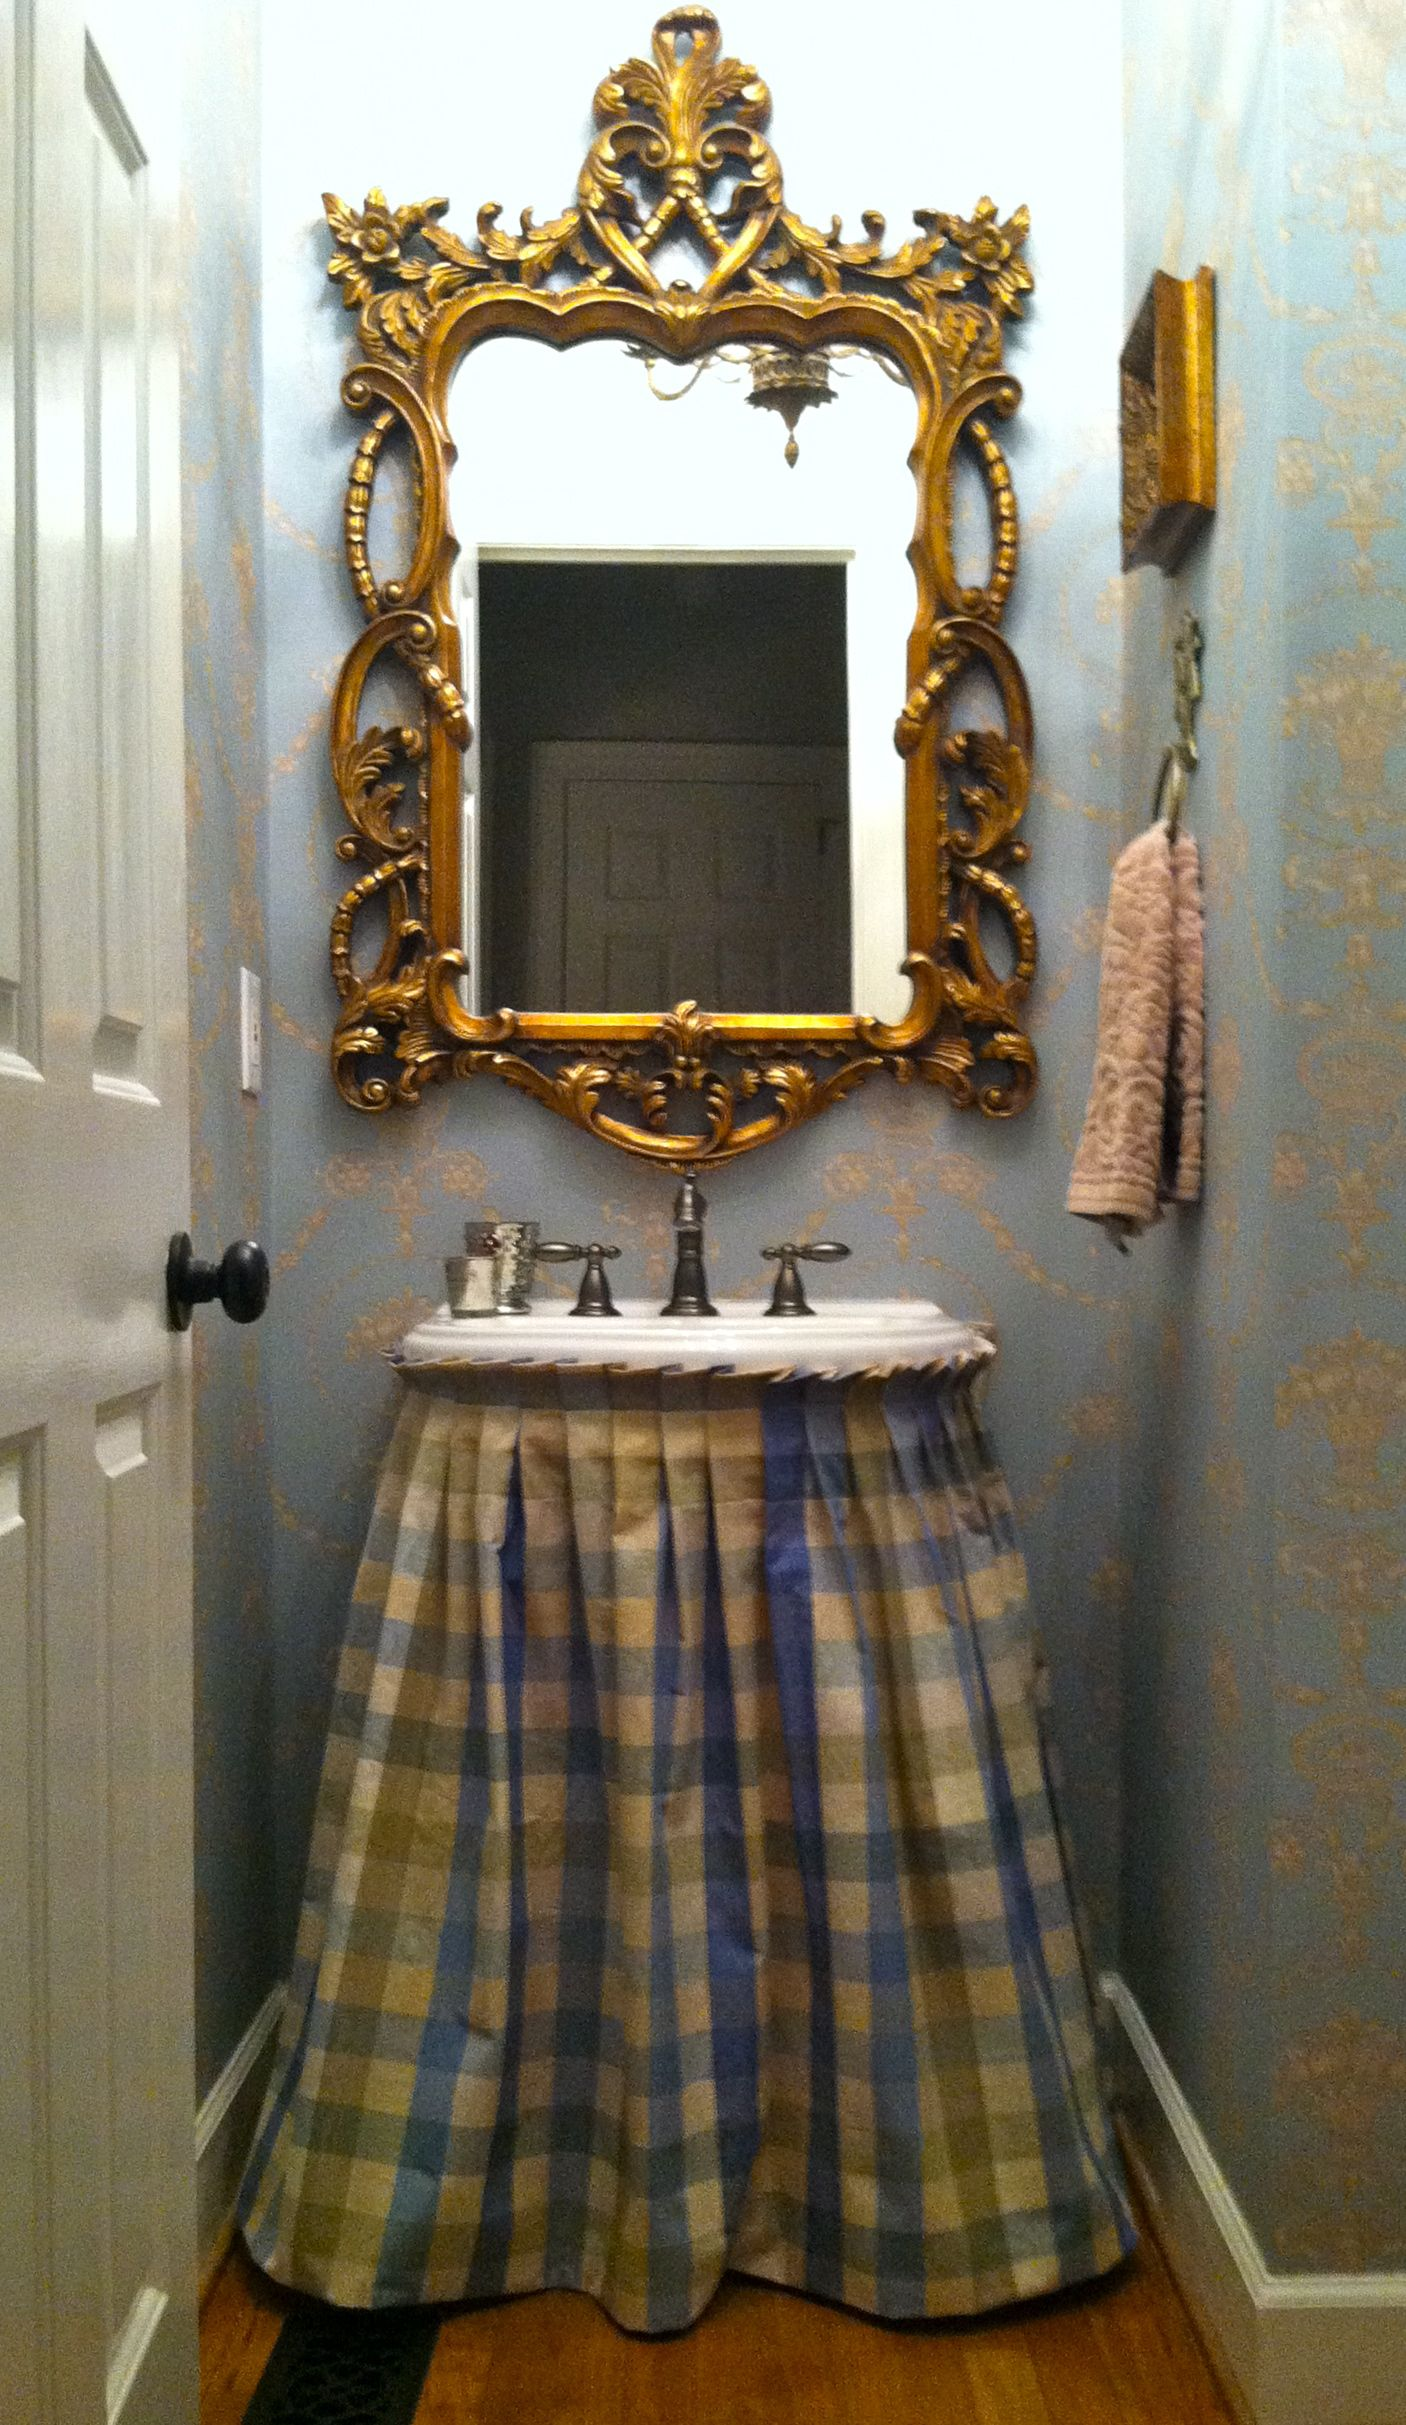 fabric sink skirts - Google Search | Sink skirt, Powder ...